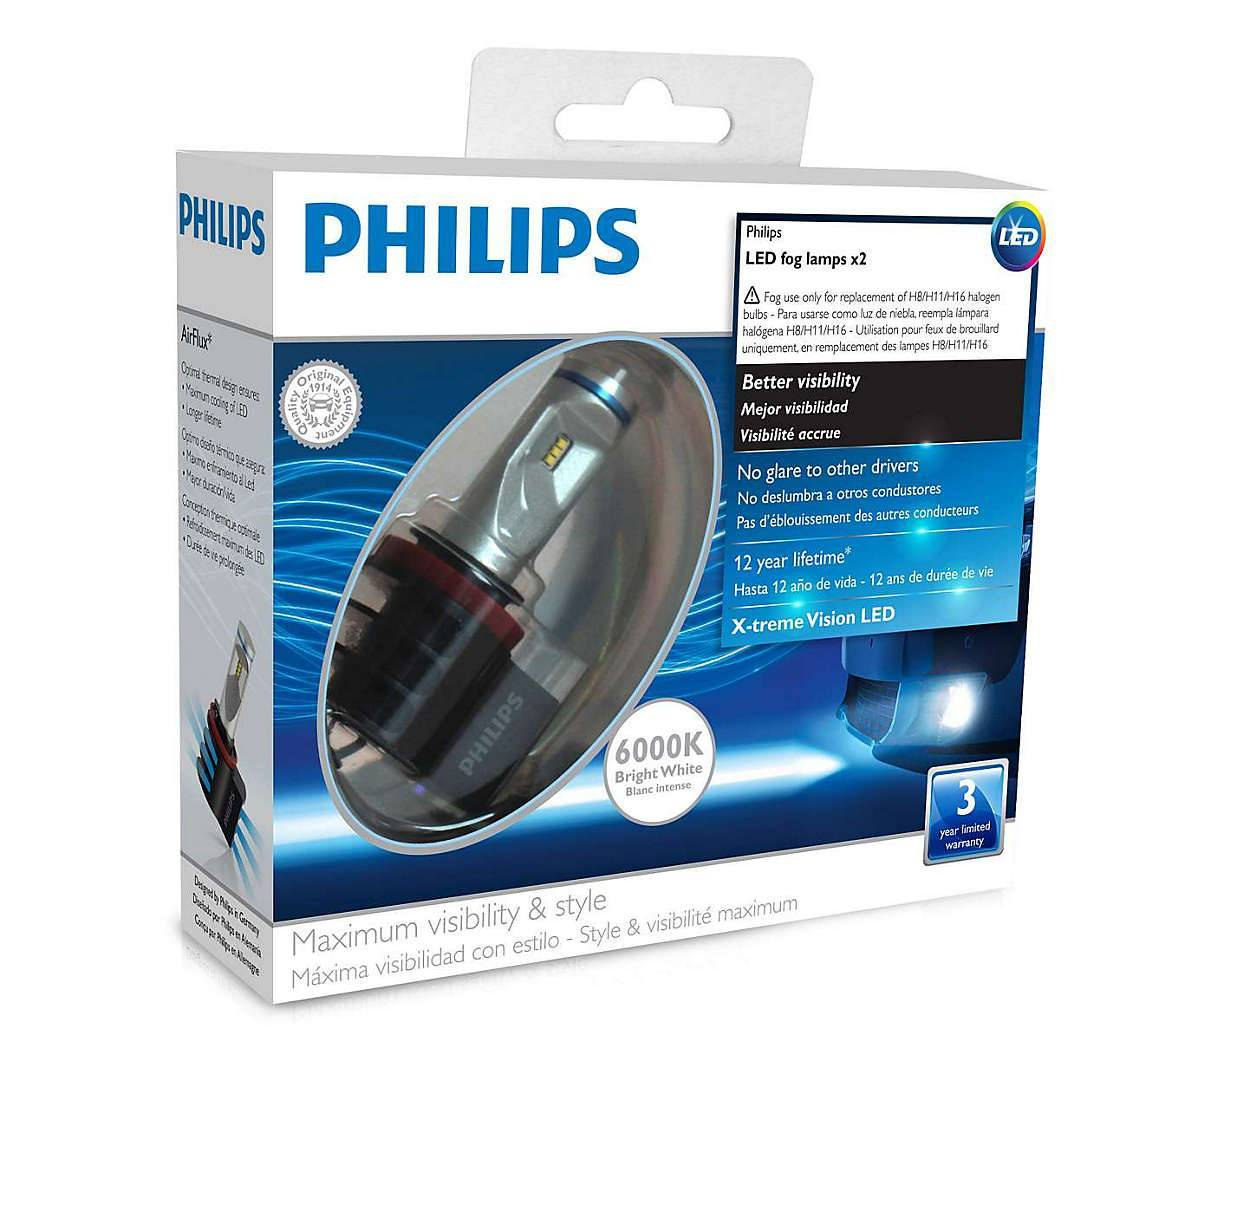 X-tremeUltinon LED Lâmpada para Faróis Automotivos para Neblina - Loja FullPower